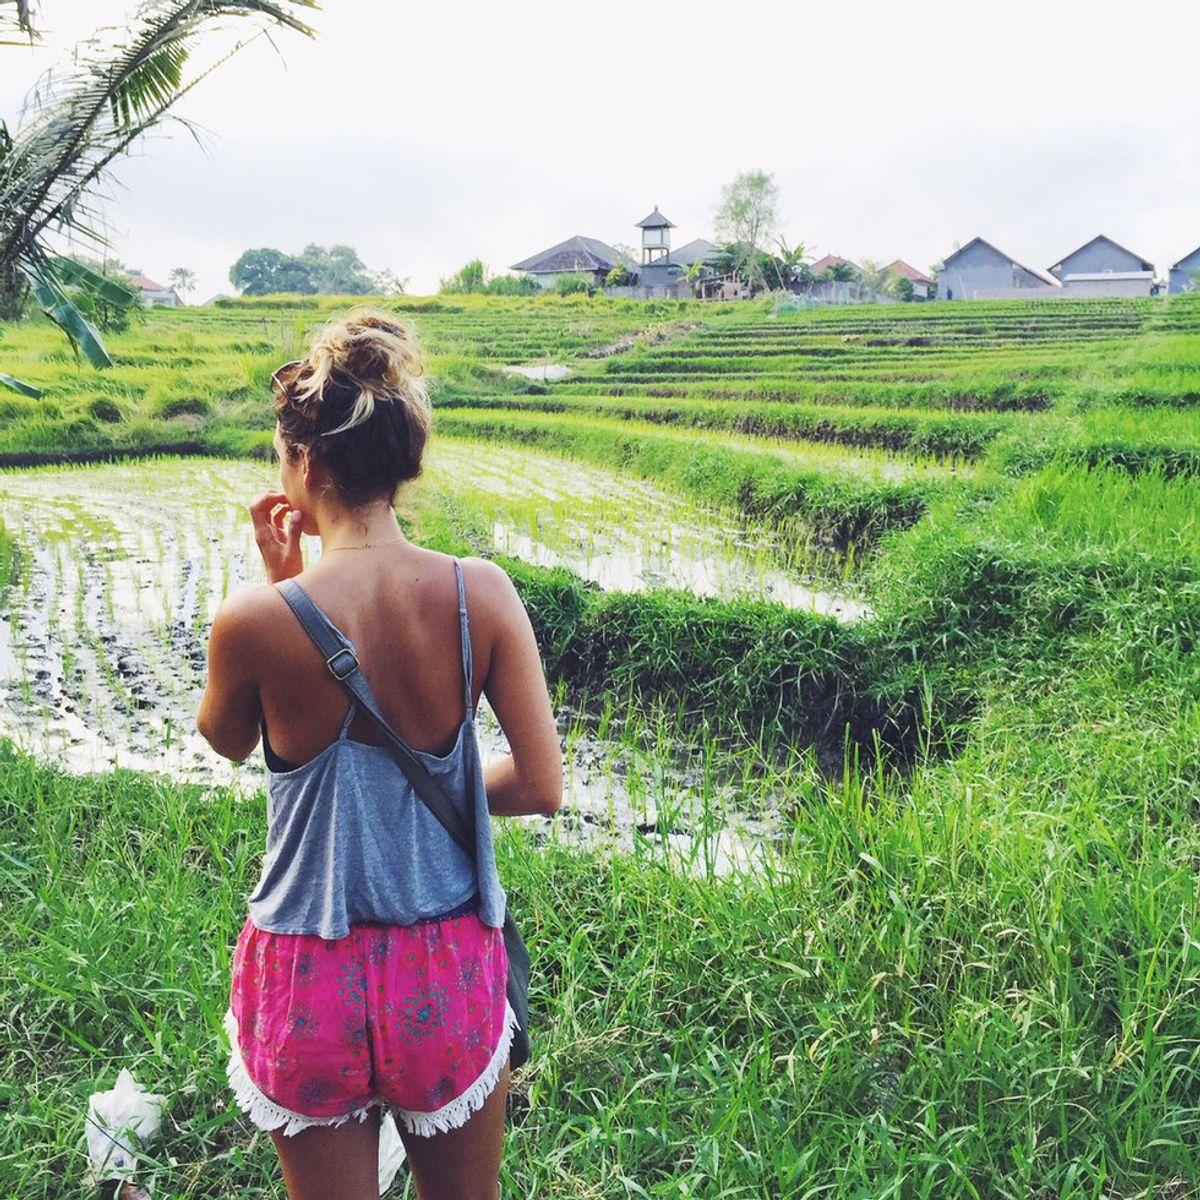 The Gap Year Experience: Abby Clayden